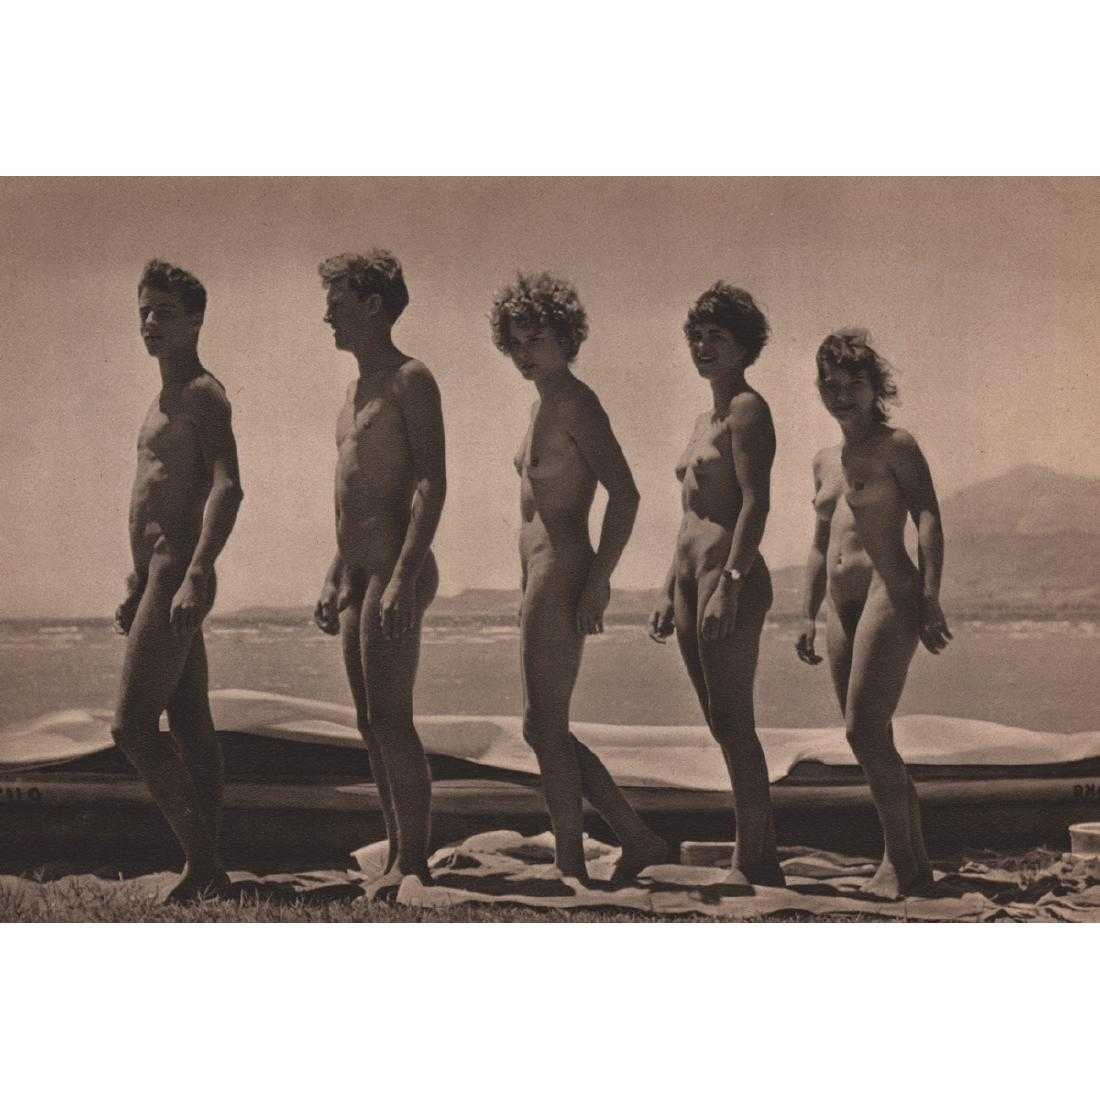 HAJO ORTIL - Nudes - 2